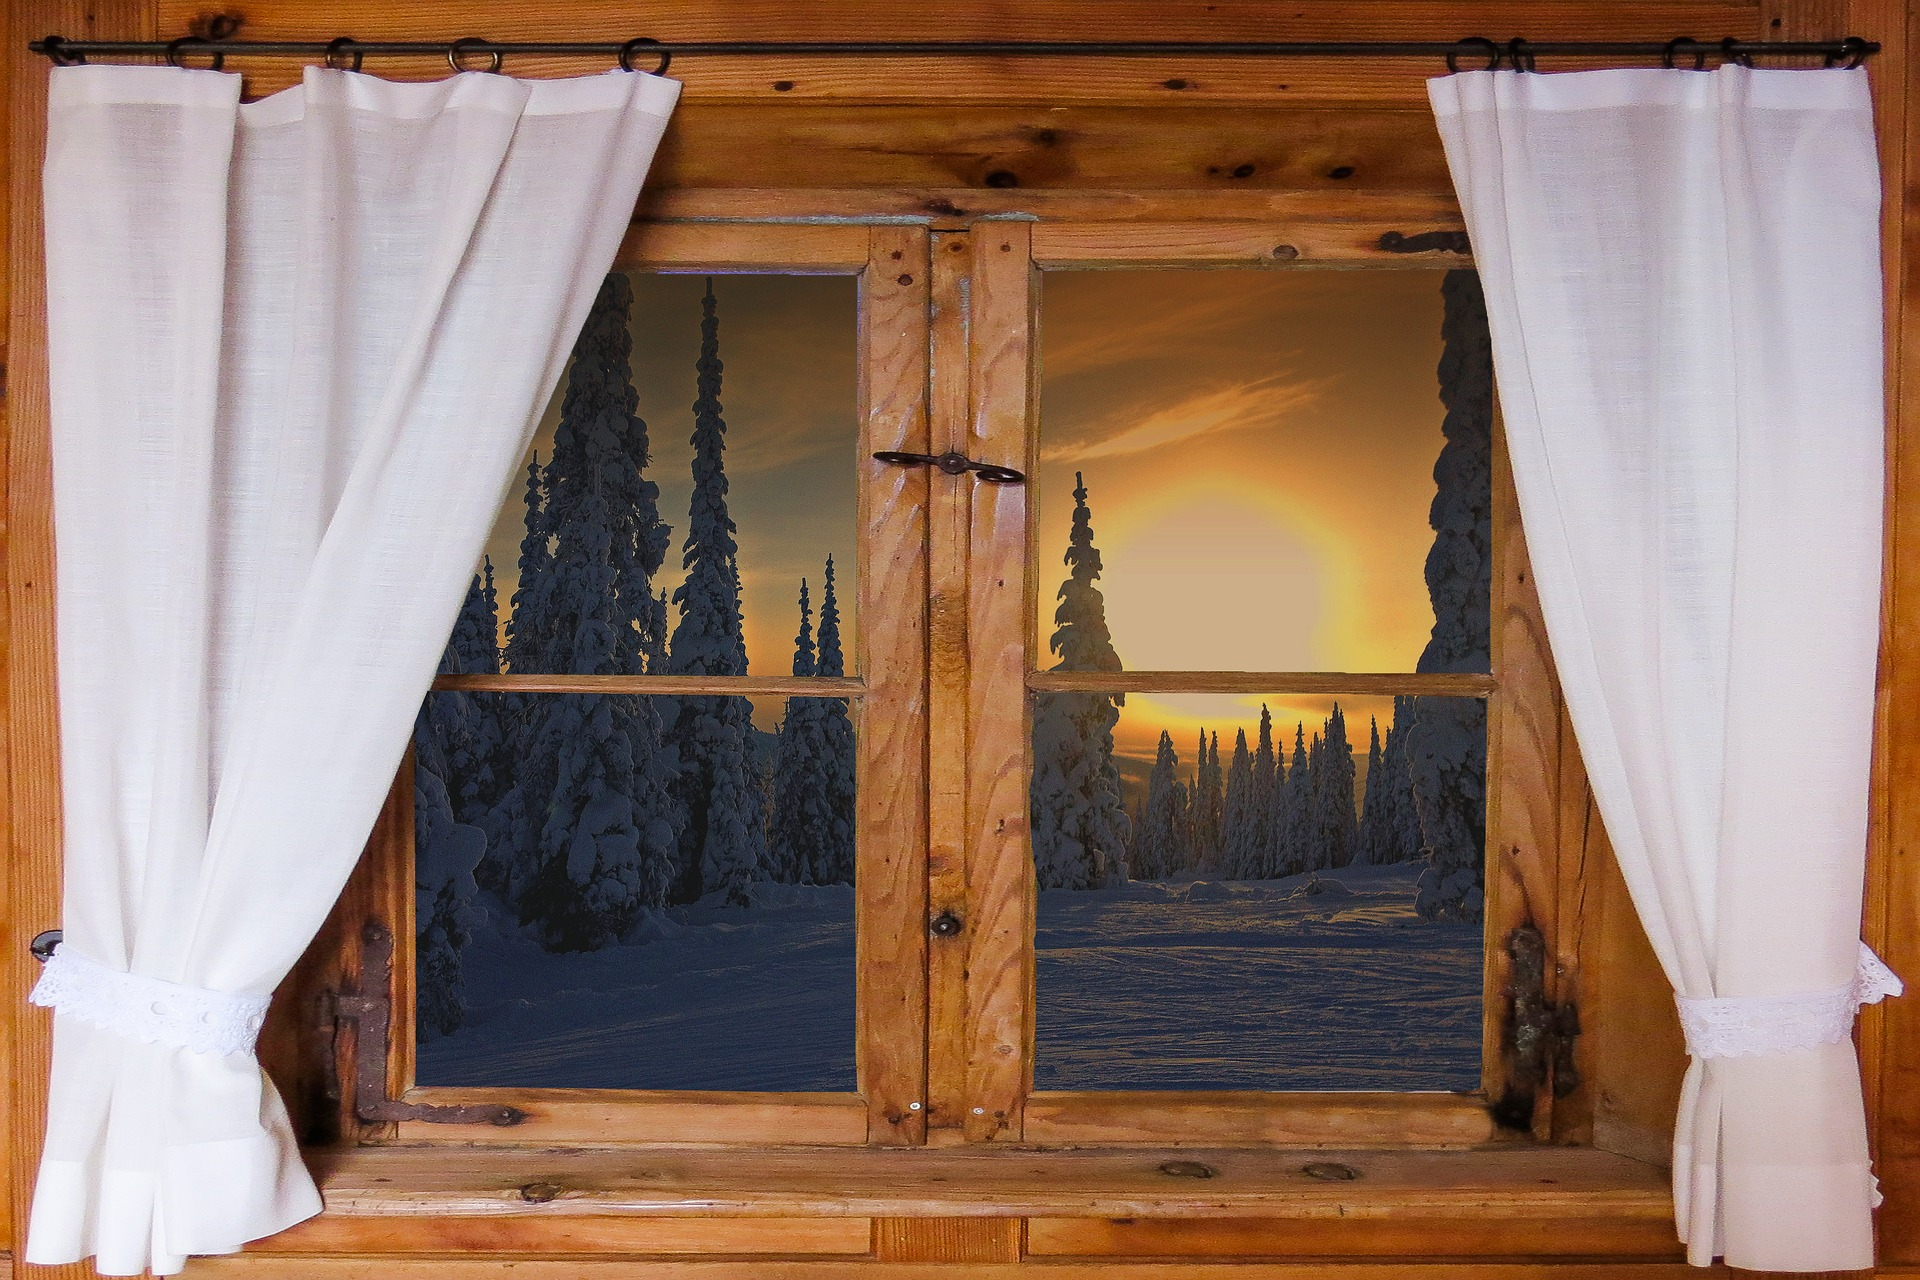 aerul curat in casa - sfatulparintilor.ro - pixabay_com - nature-2934245_1920